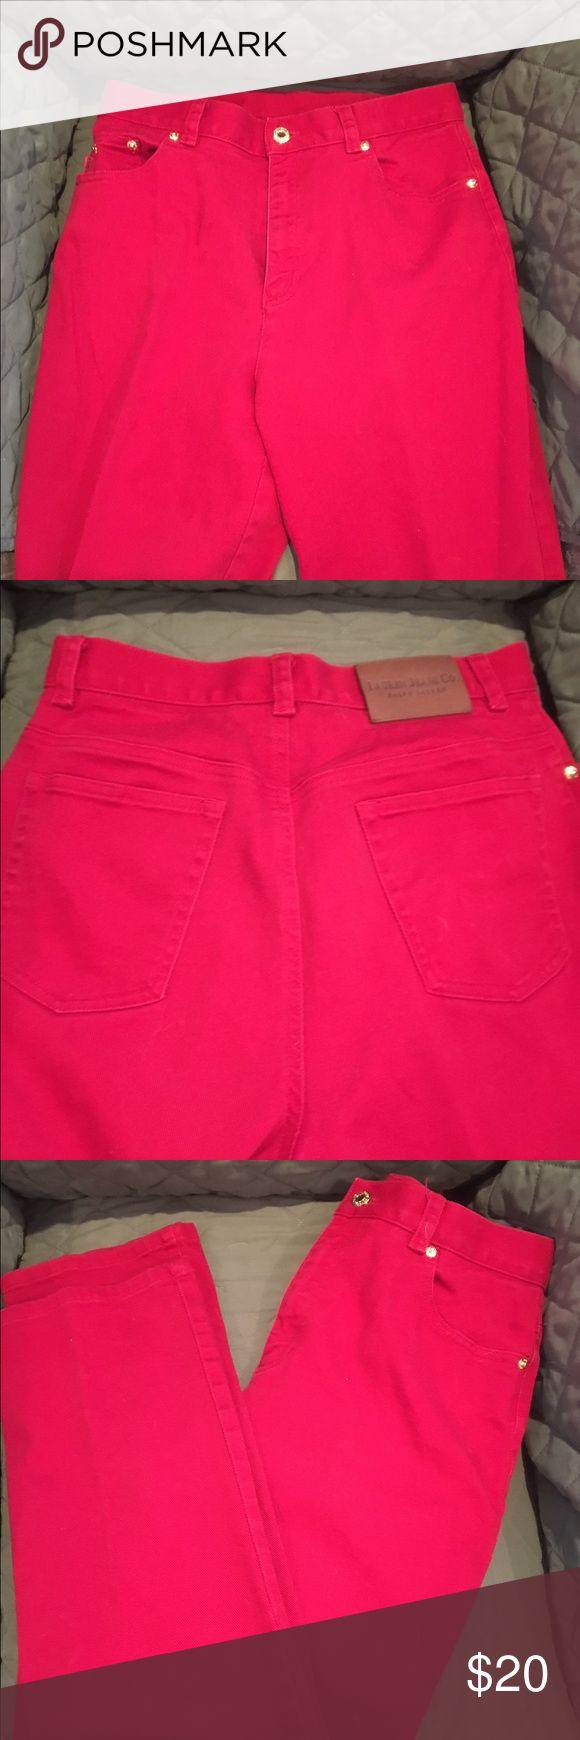 Ralph Lauren red trousers Ralph Lauren red trousers. Jeans cut. Size 6 Ralph Lauren Jeans Straight Leg